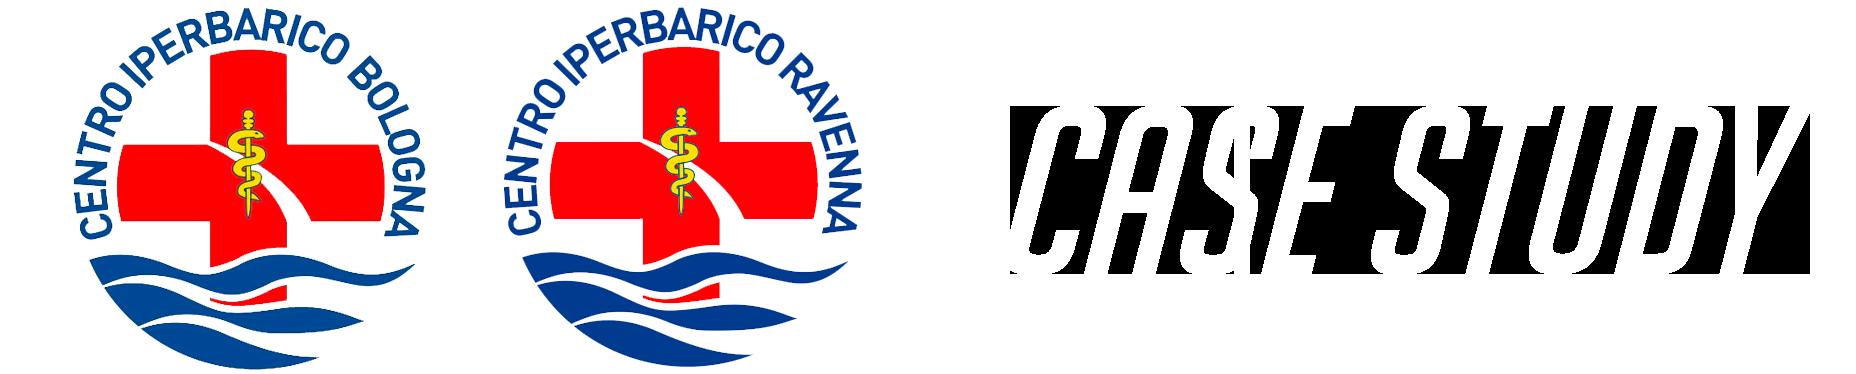 SC-Case-Study-Logo-Centro-Iperbarico-1